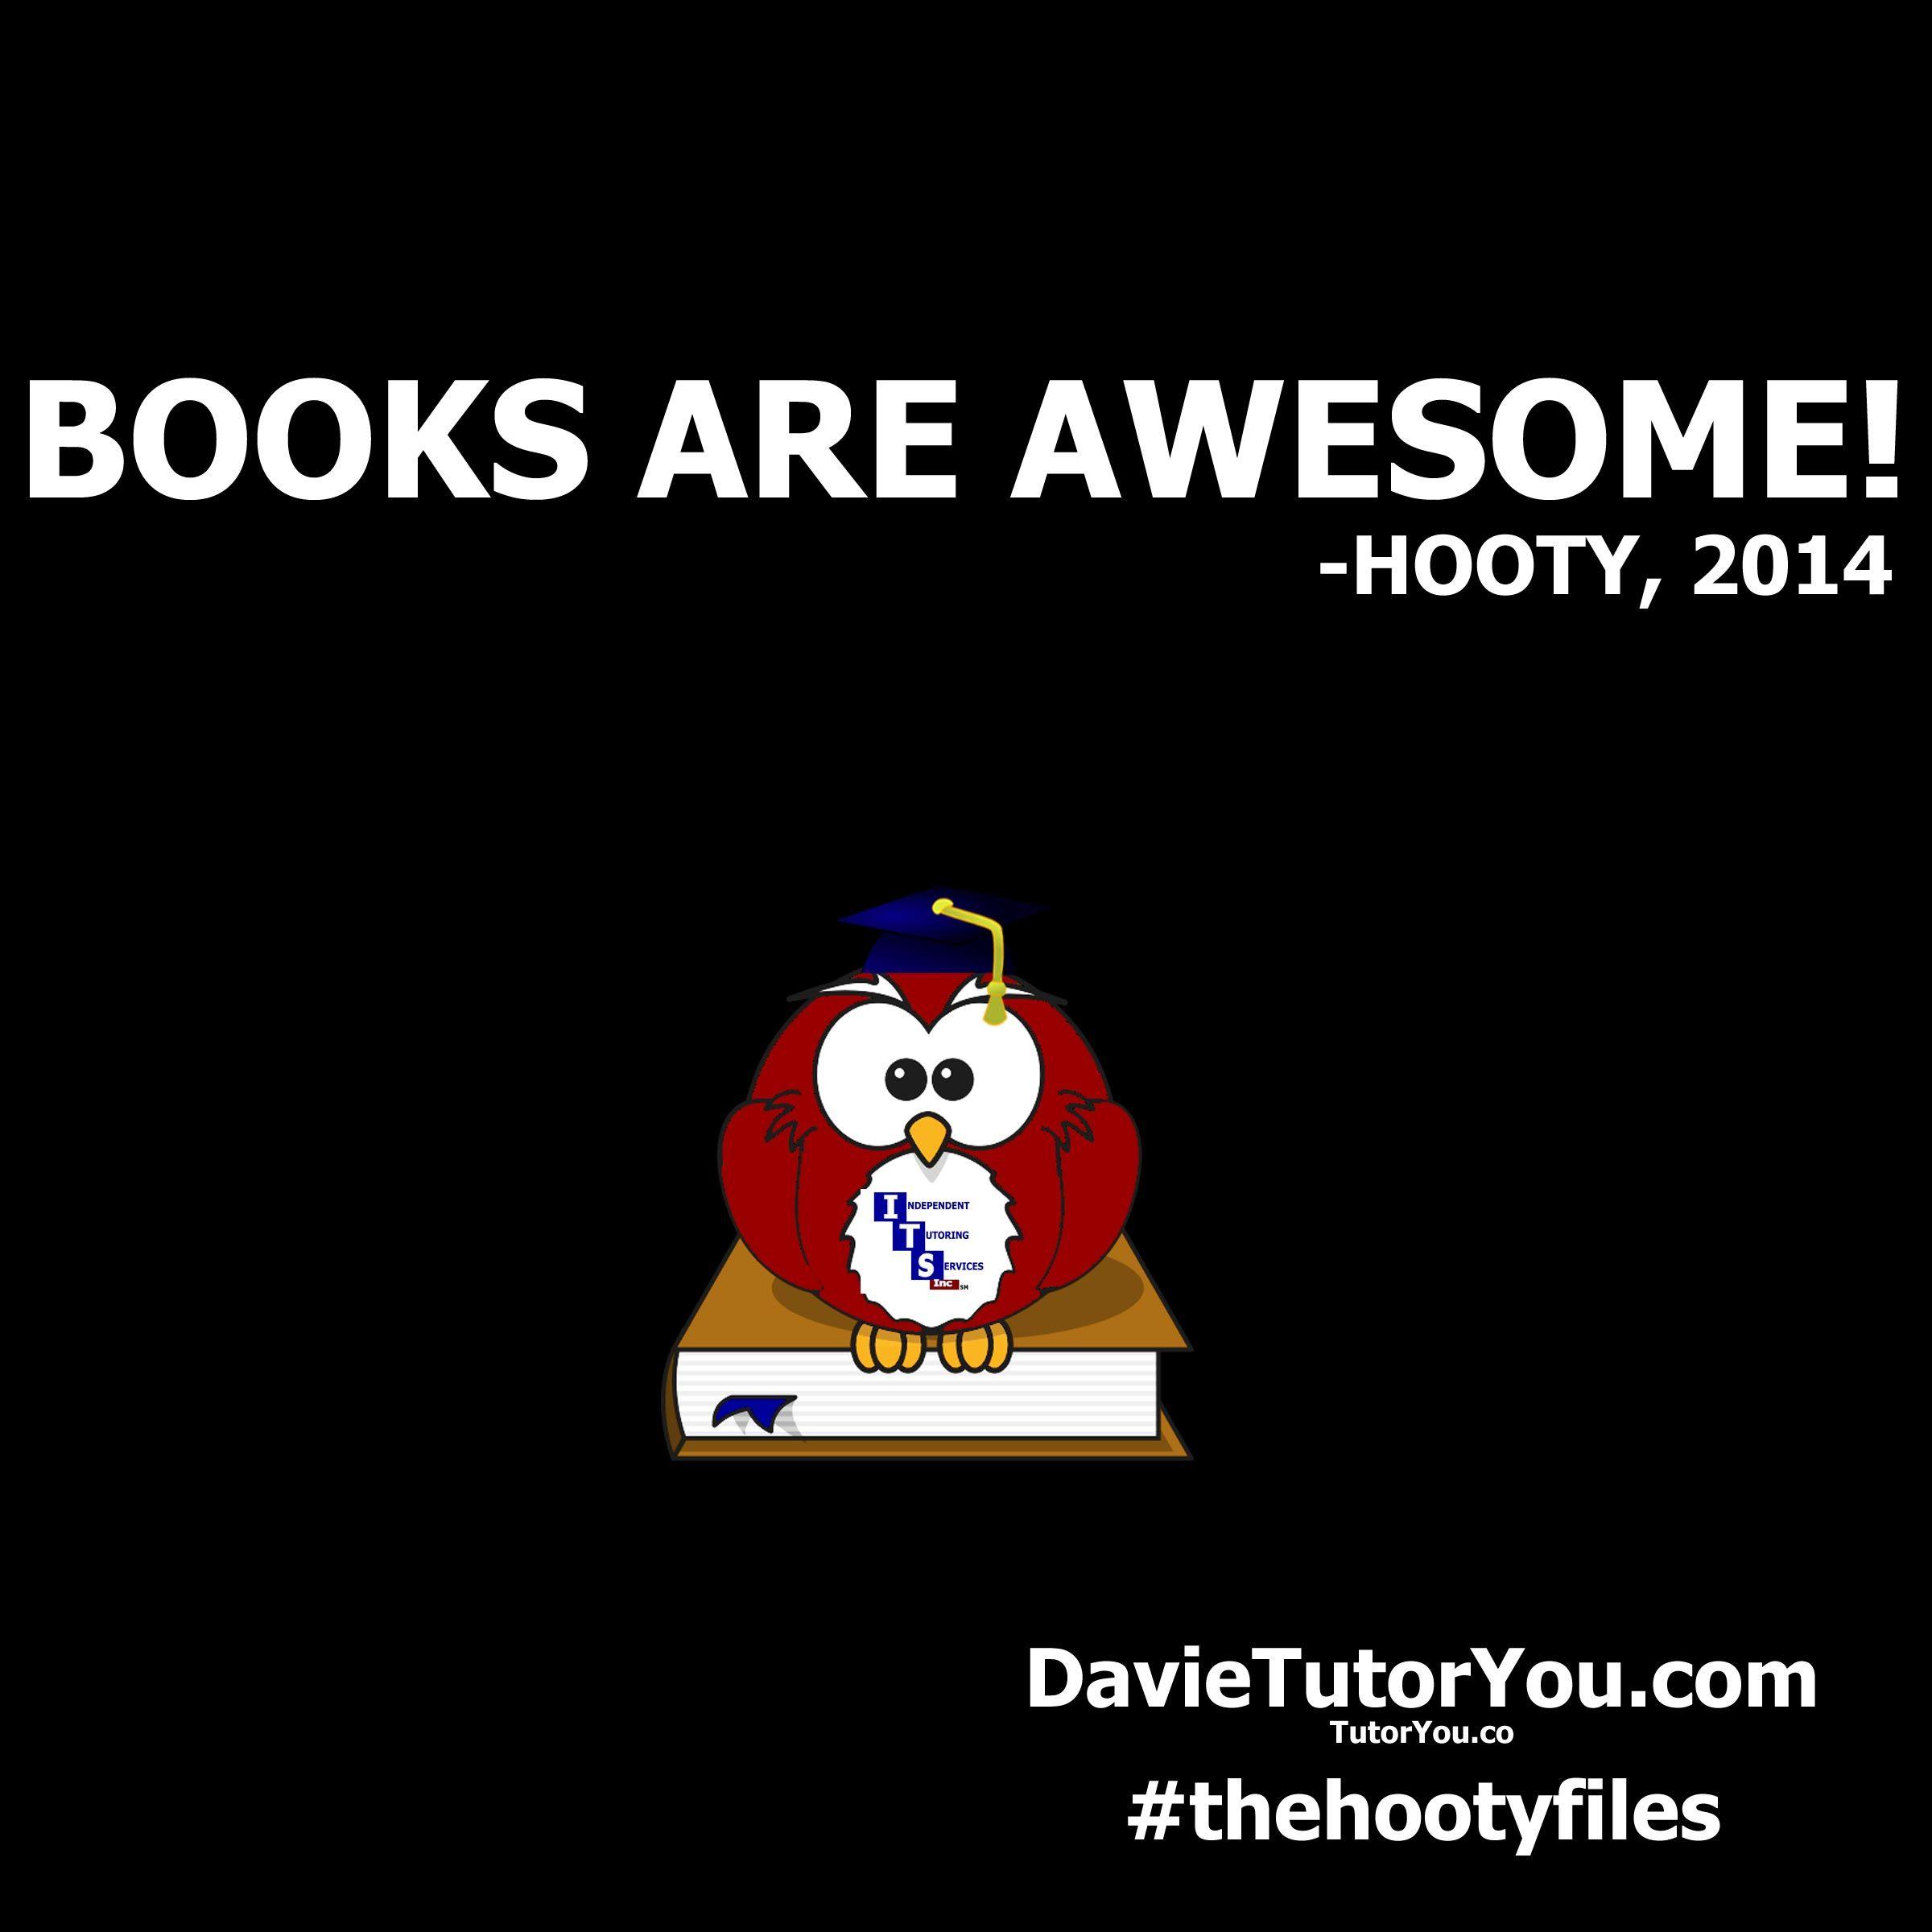 Whoo likes books?  Hooty does!